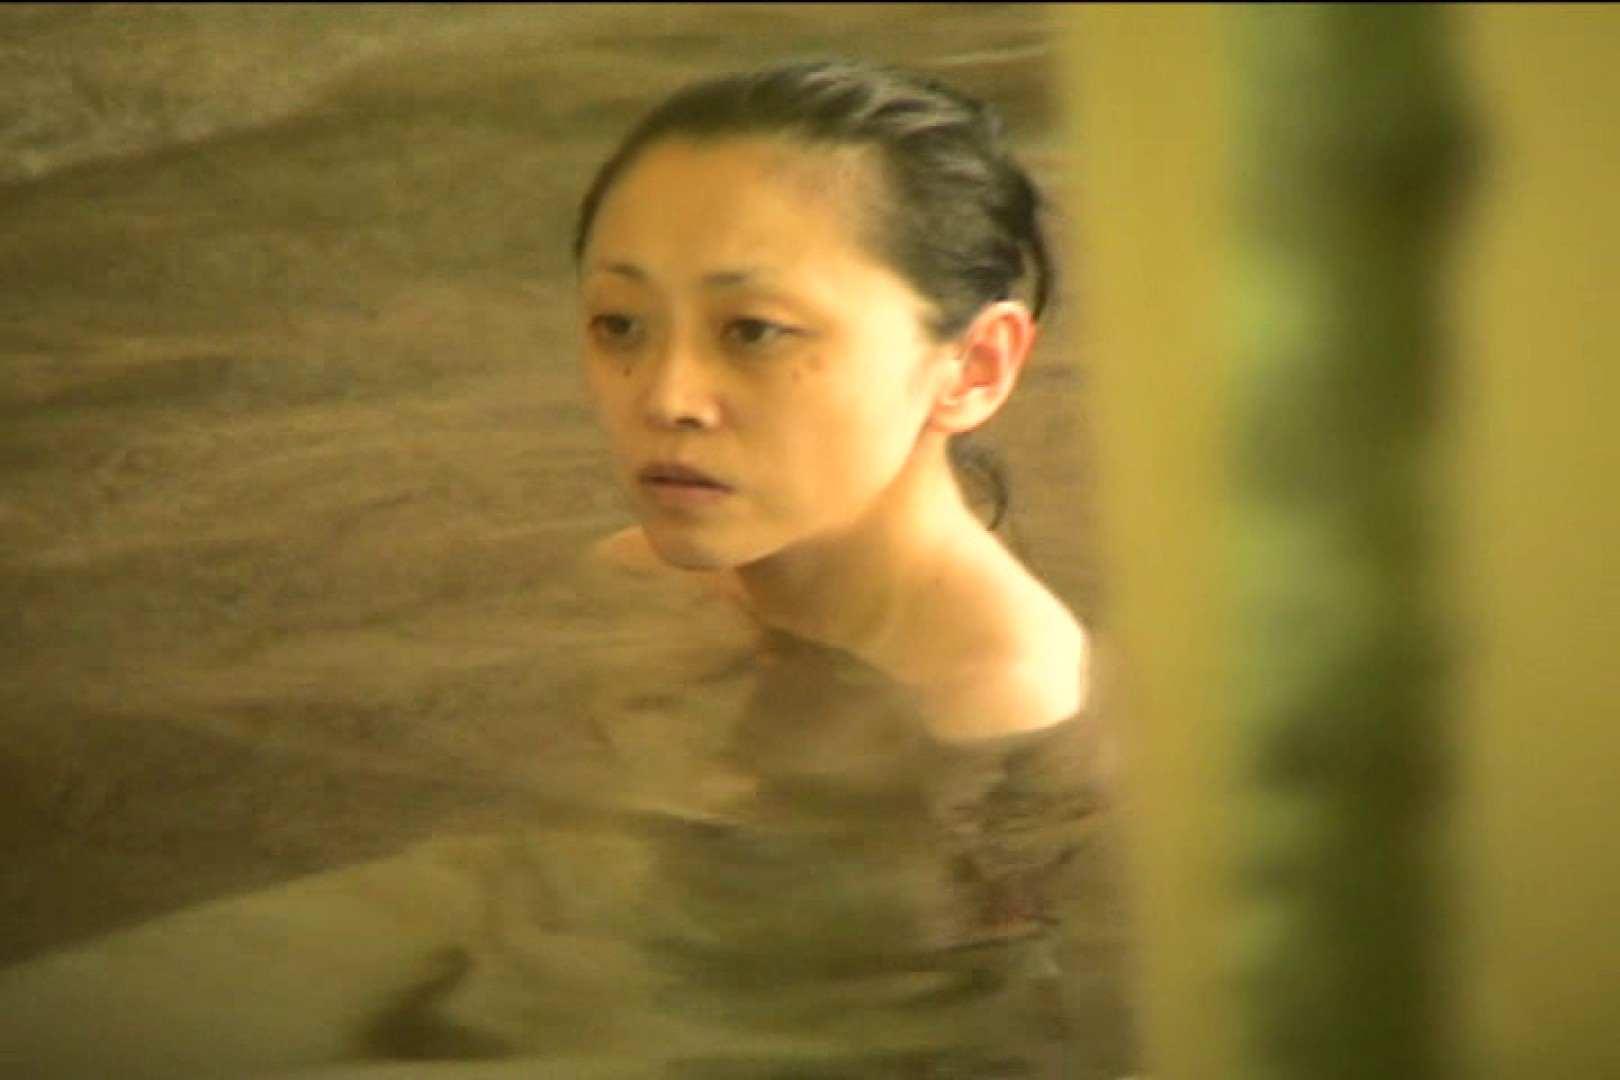 Aquaな露天風呂Vol.454 露天   HなOL  66pic 60